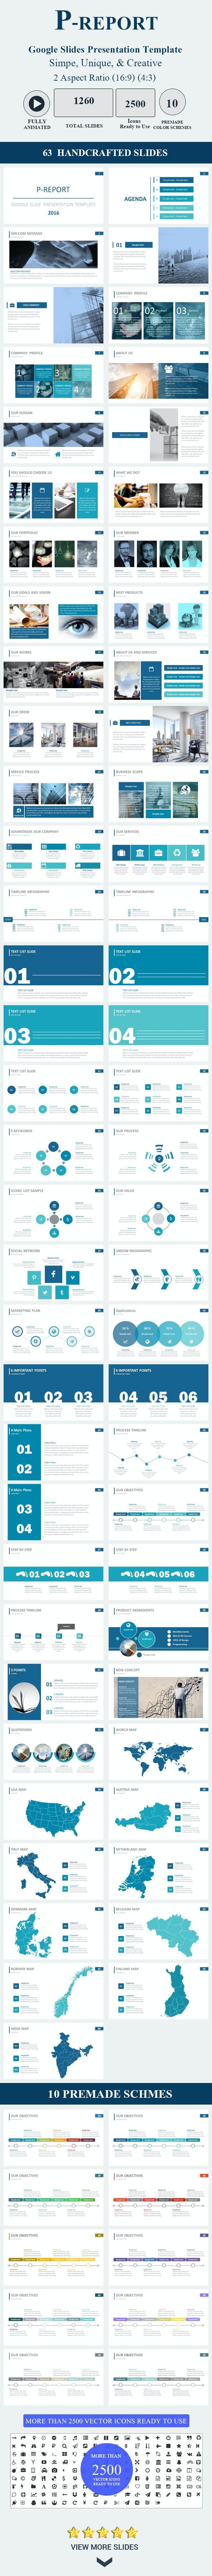 P–REPORT Google Slides Presentation Template - Google Slides Presentation Templates